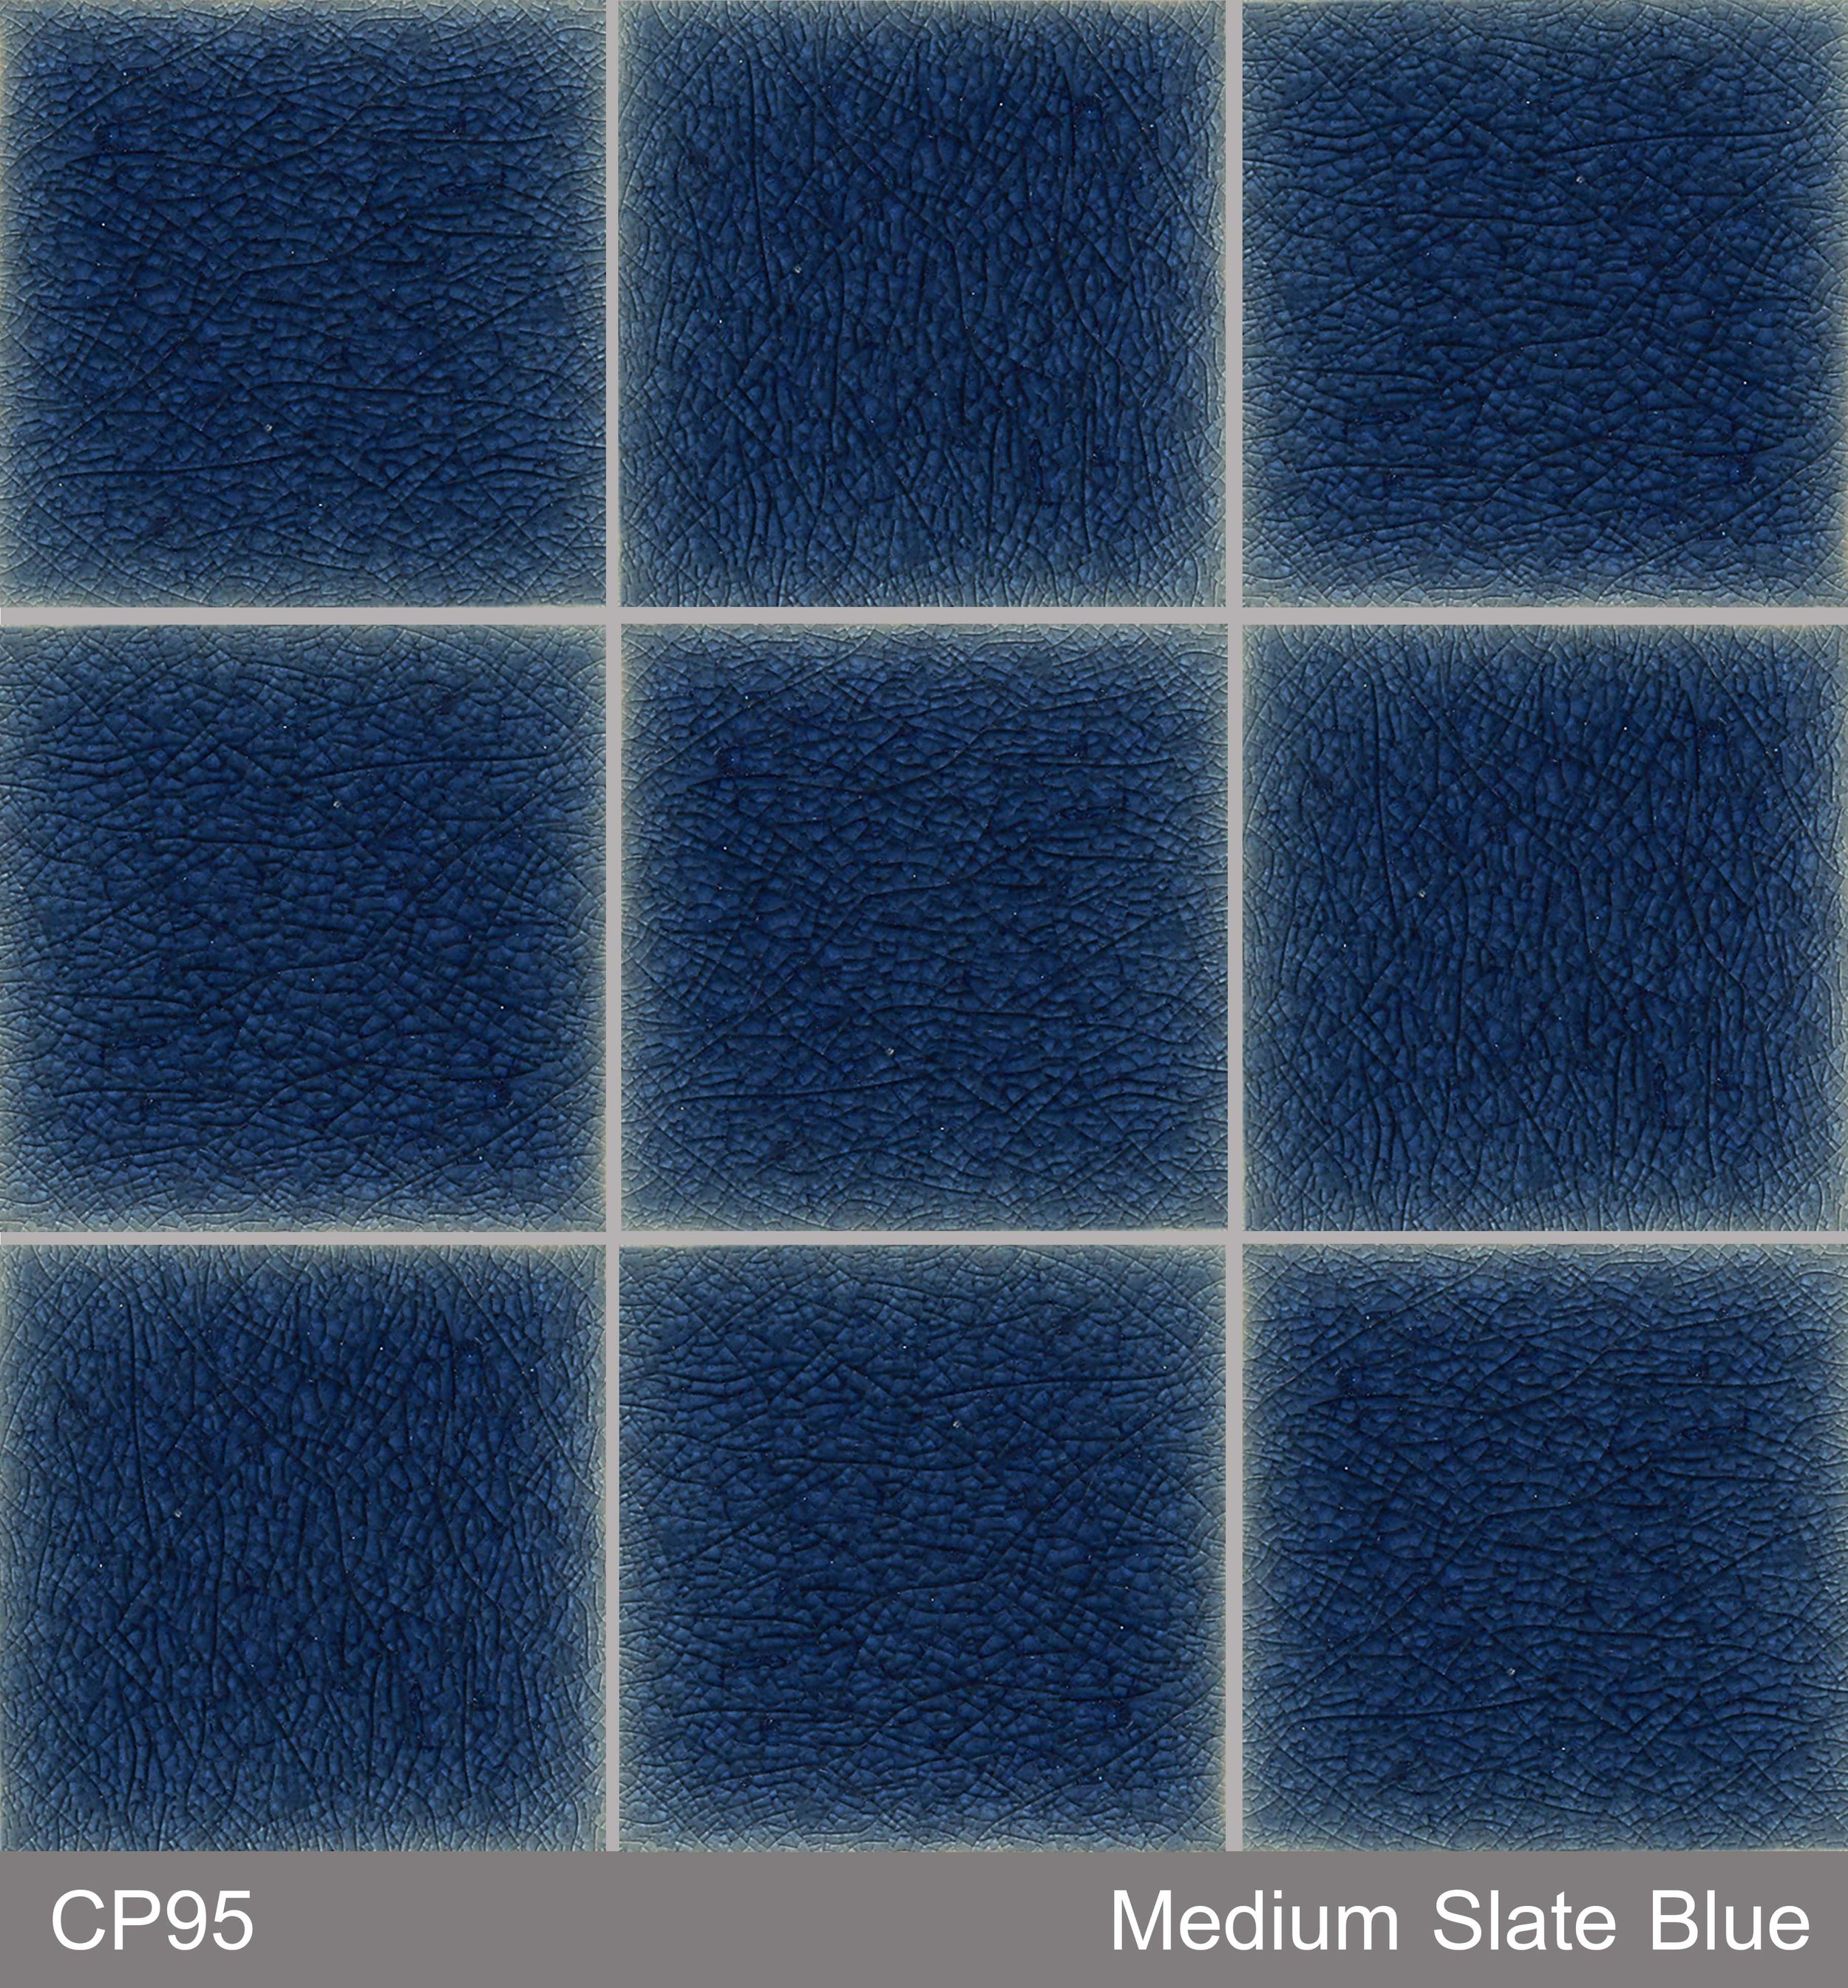 CP95 : Medium slate blue